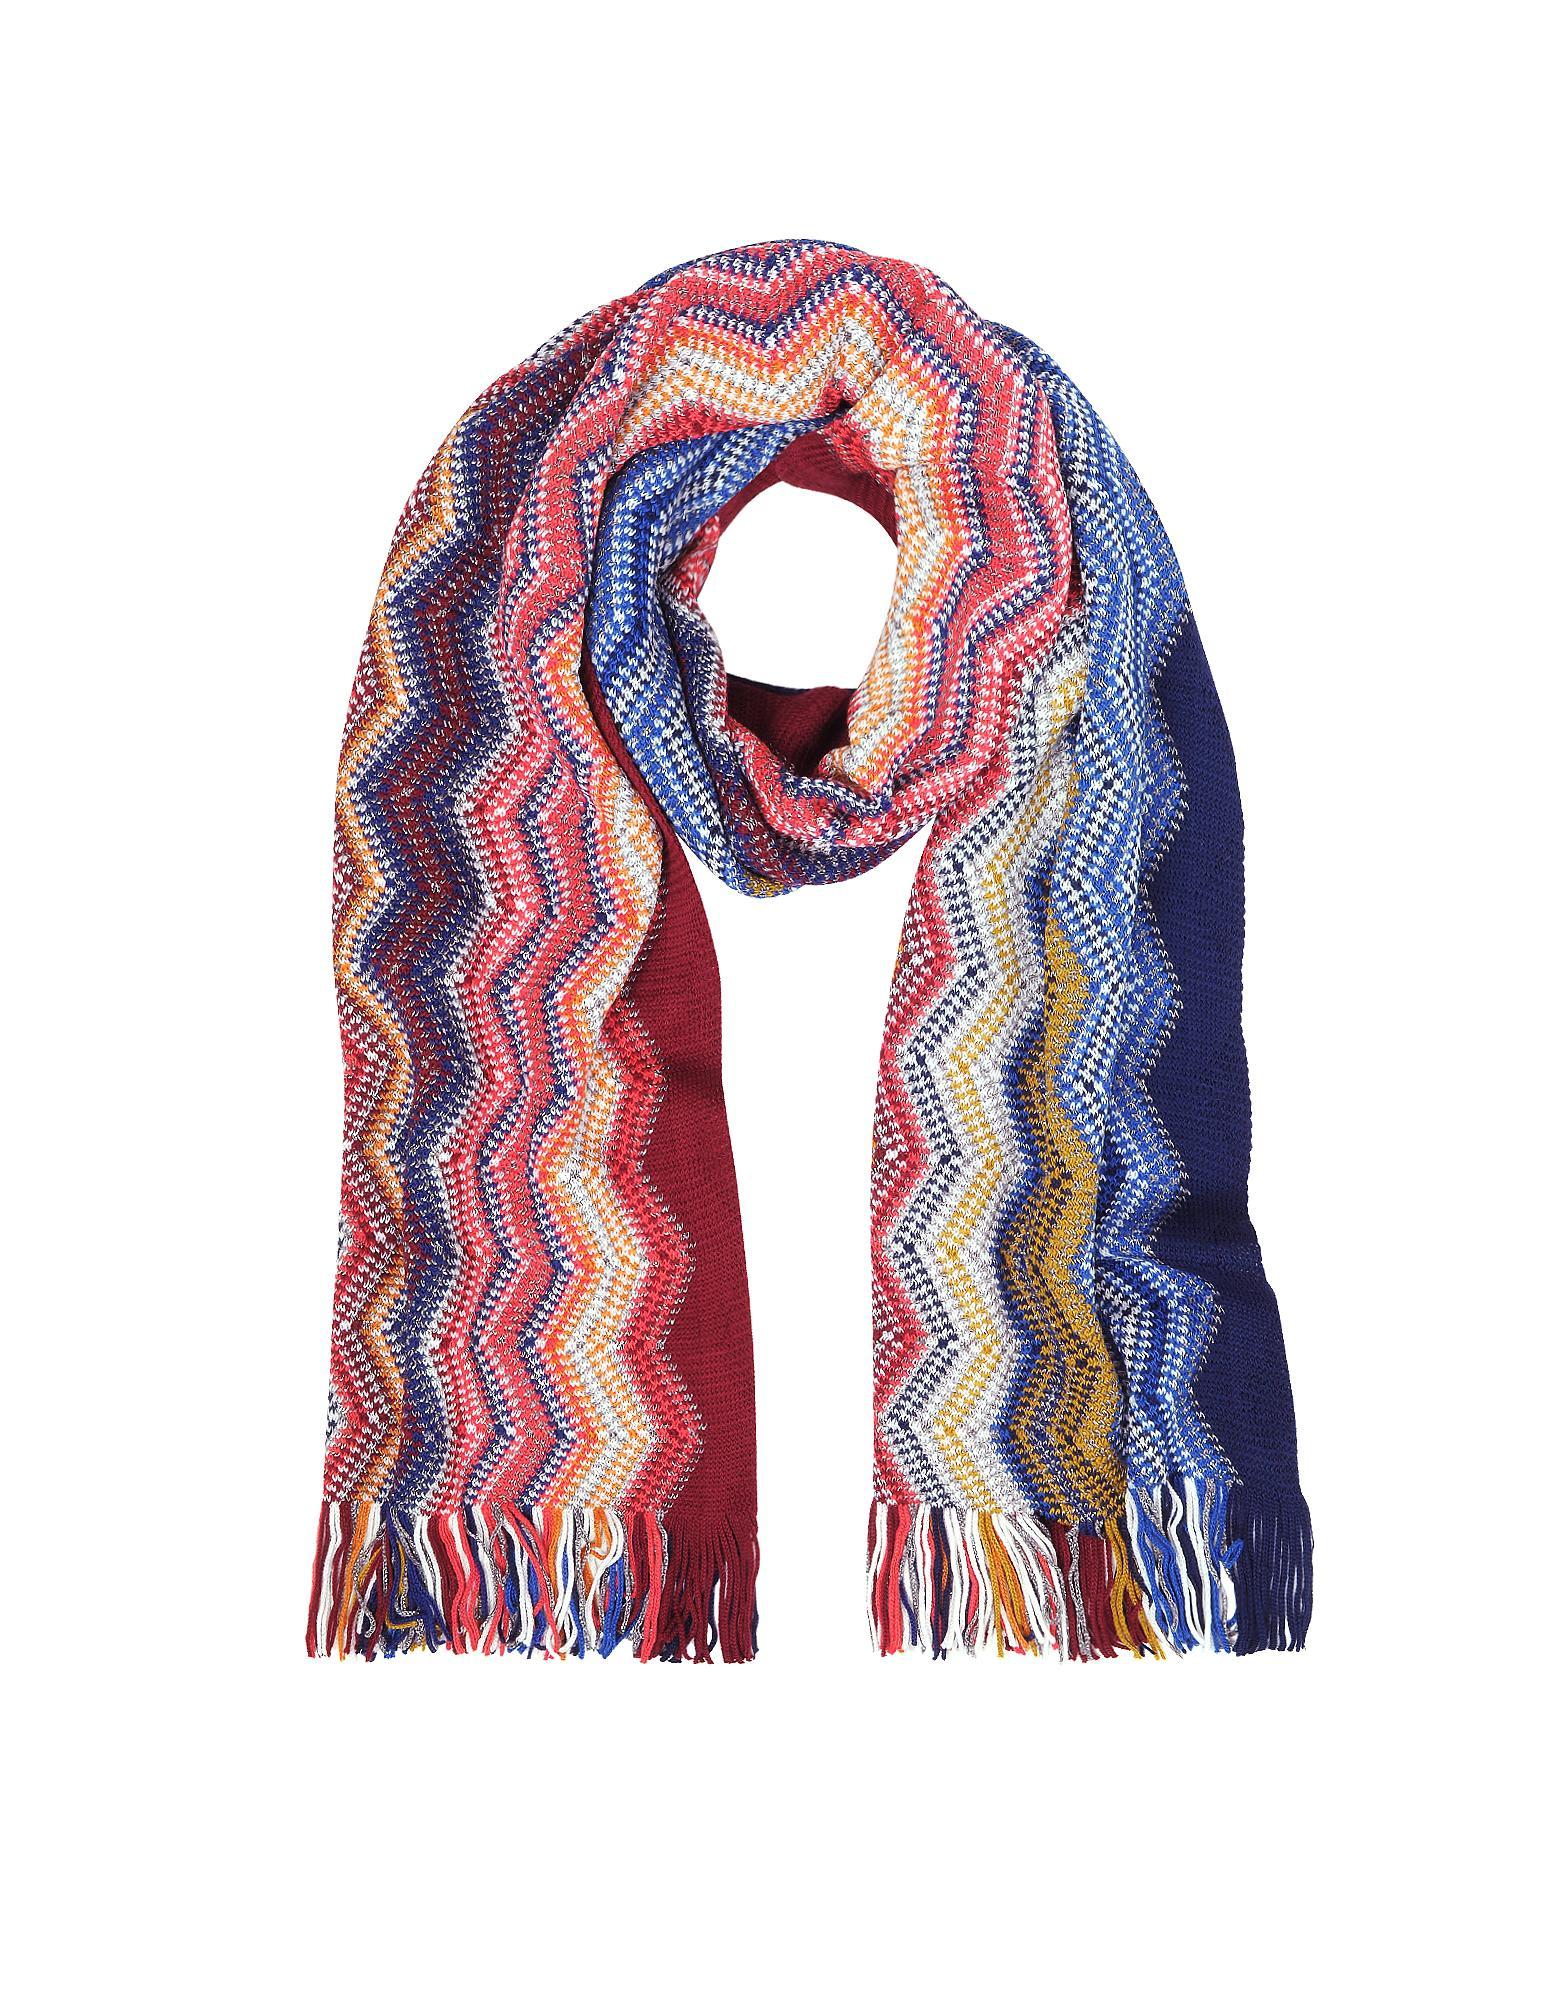 860df5a0f Lyst - Missoni Blue/multicolor Large Zig Zag Acrylic And Wool Lurex ...